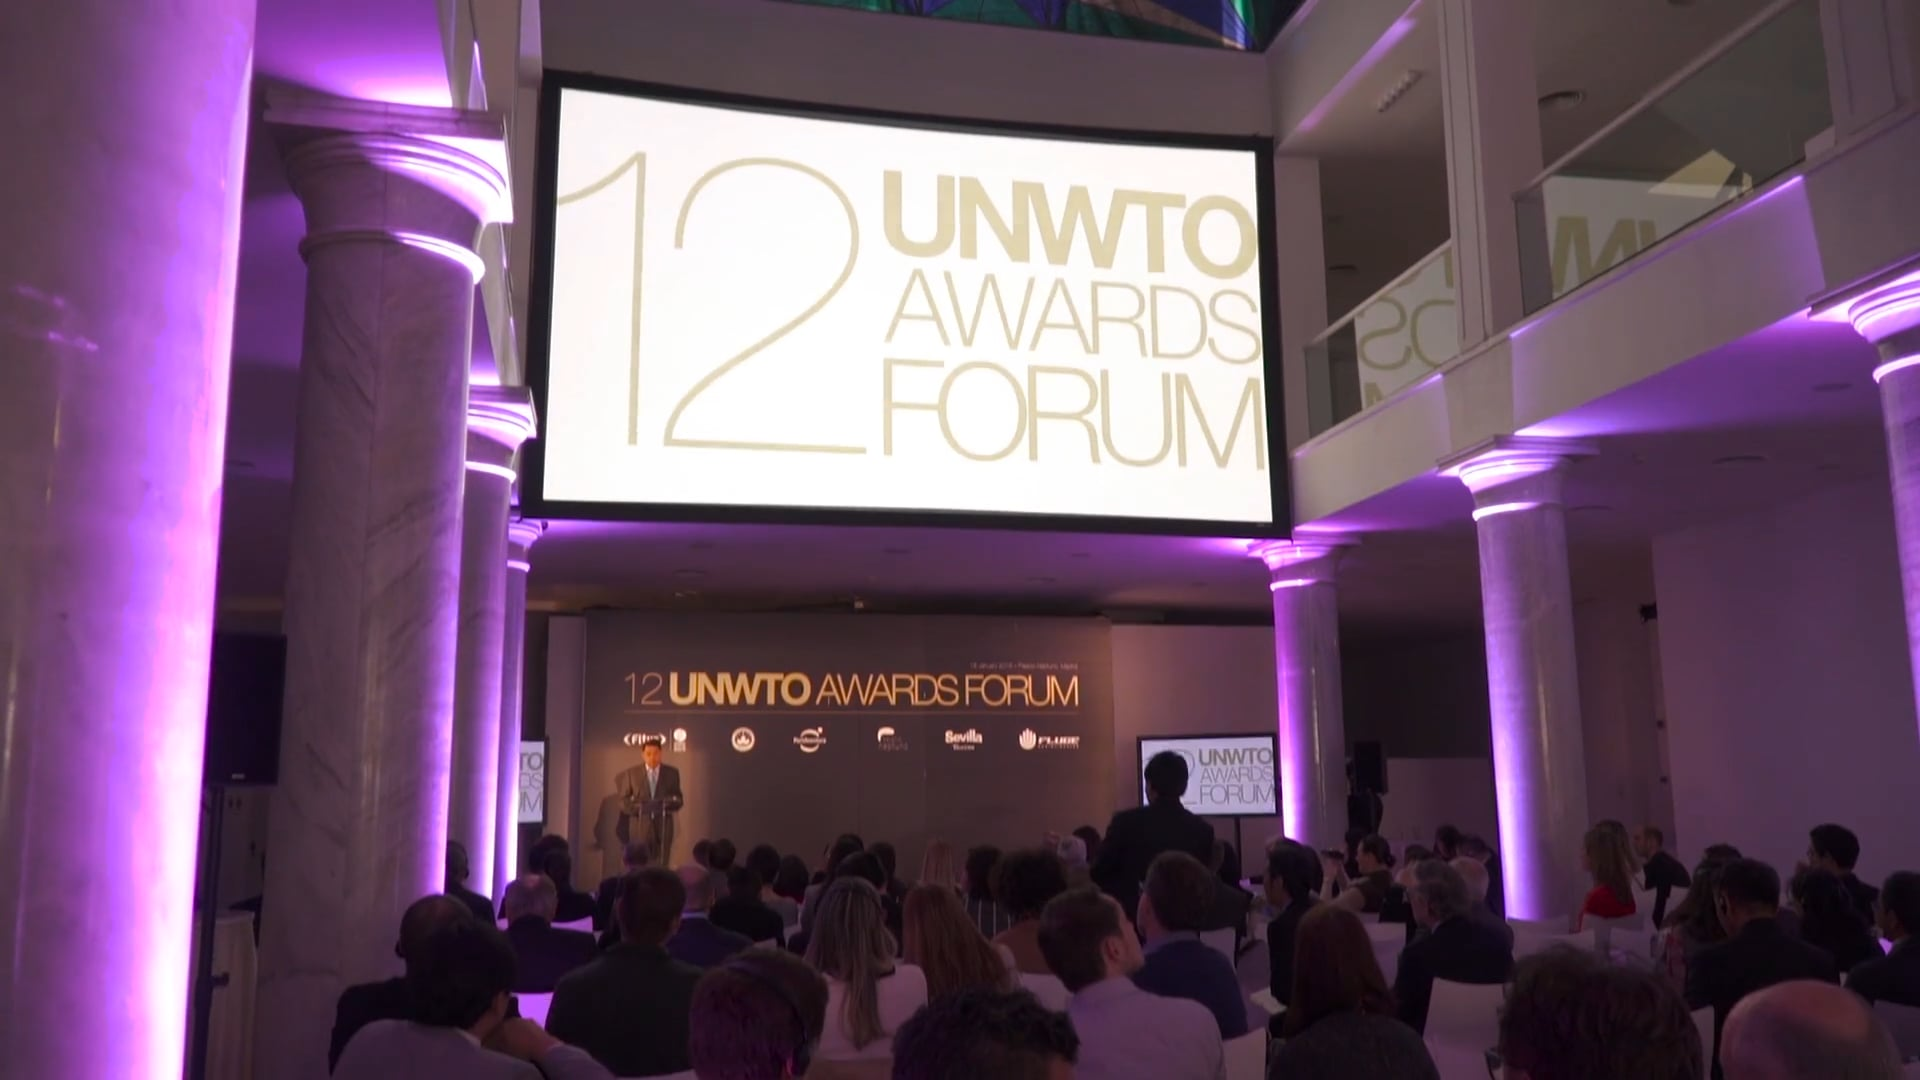 Auditorio para eventos en Madrid - Palacio Neptuno - UNWTO AWARDS FORUM